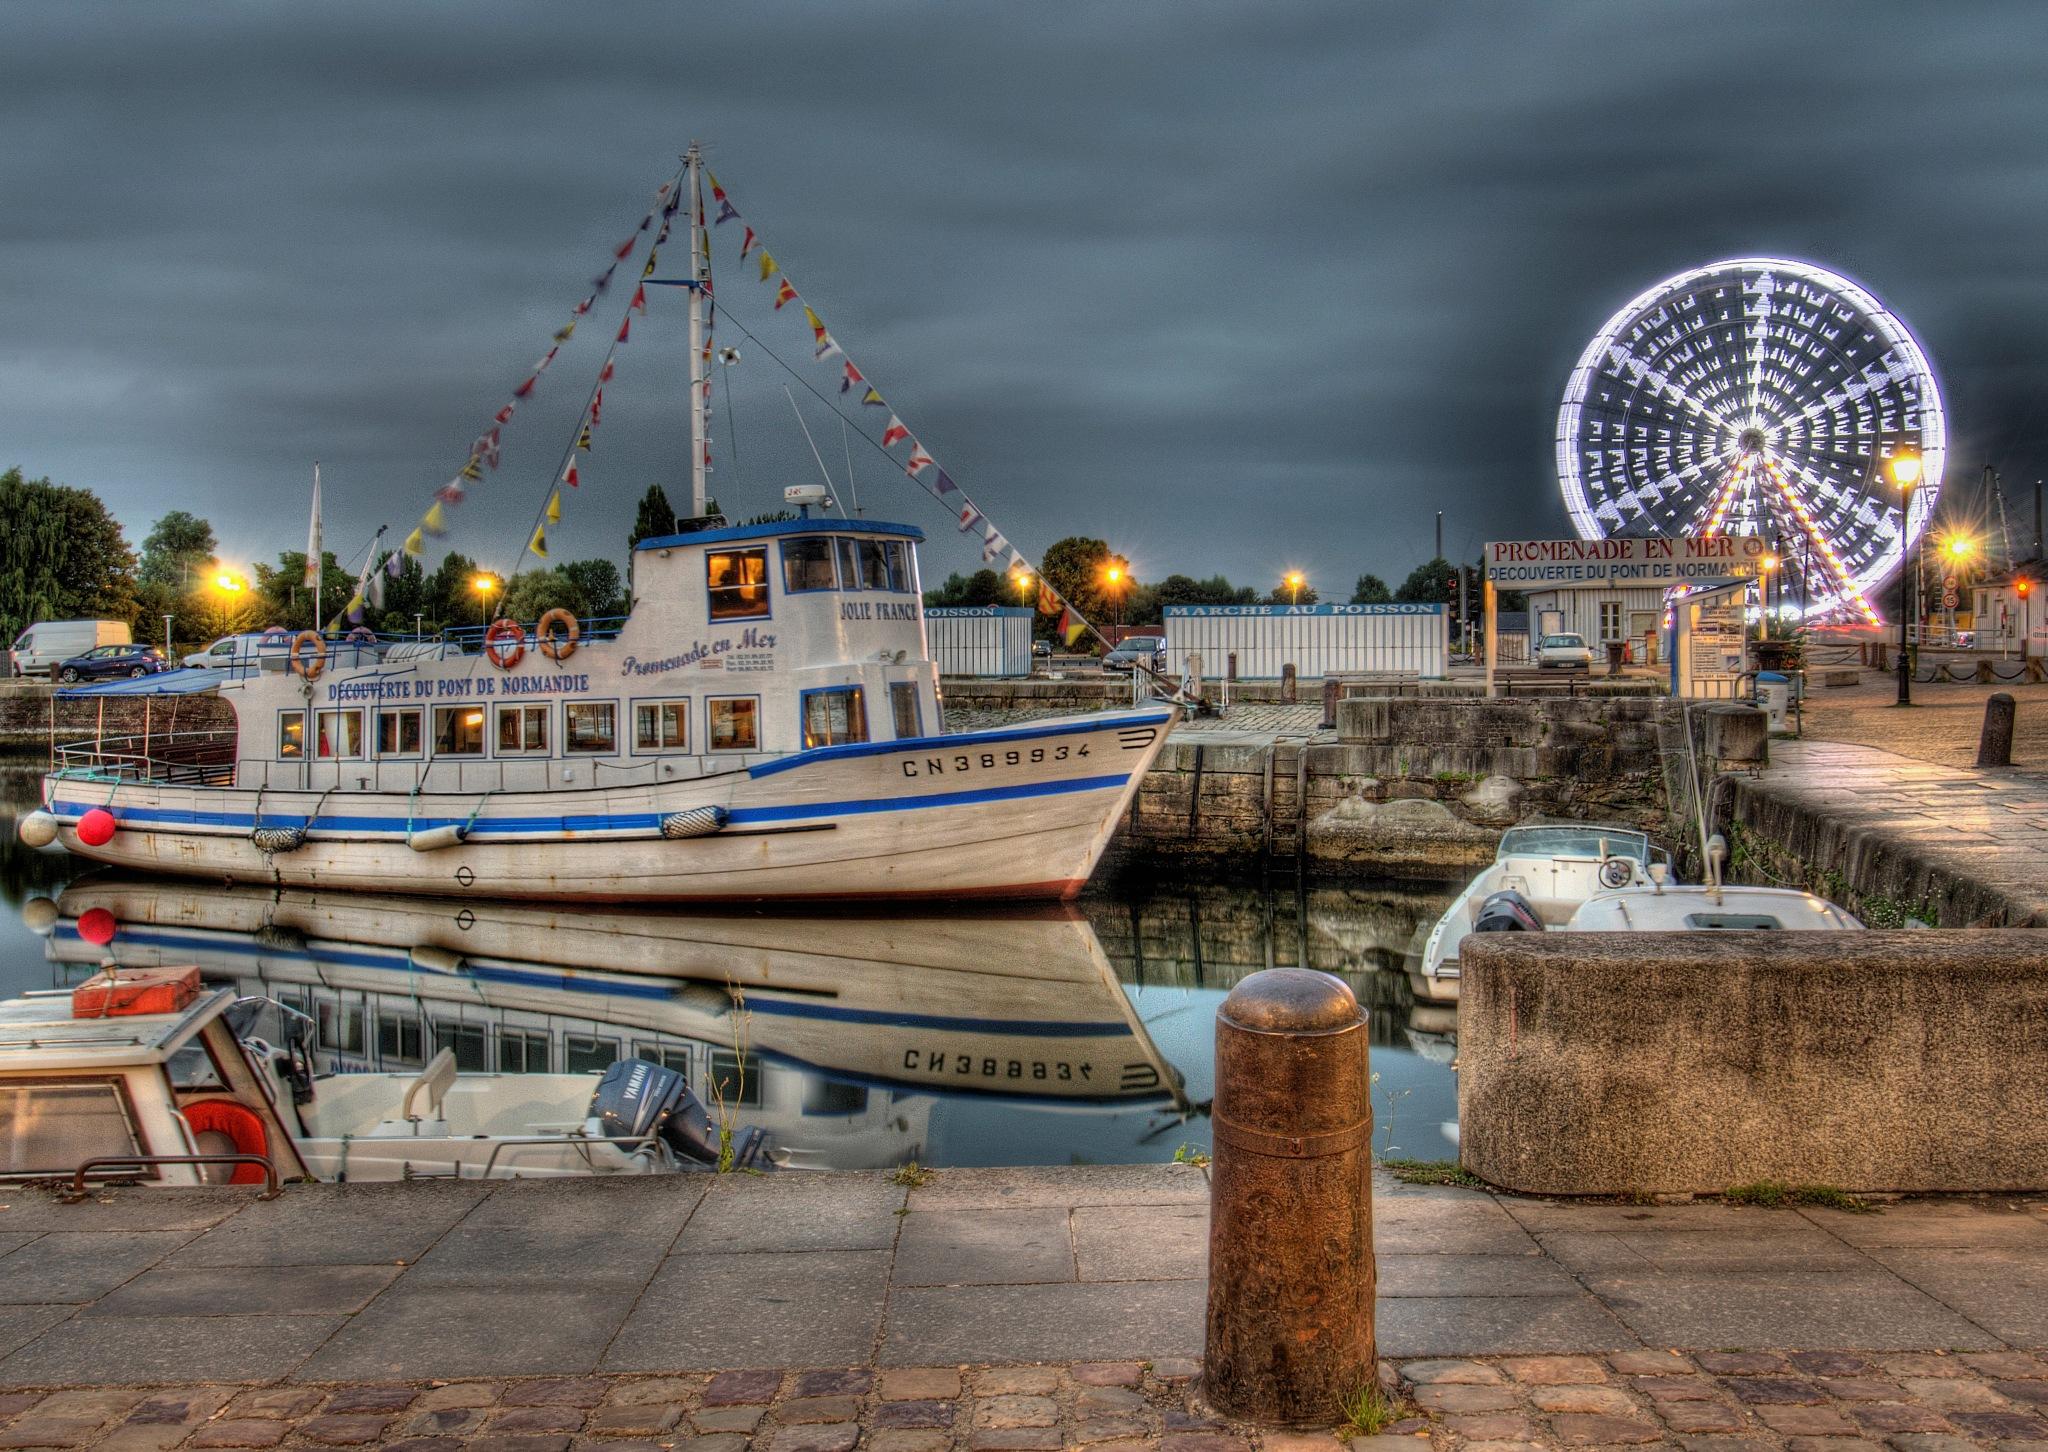 Boat and Wheel  by yawazzuk